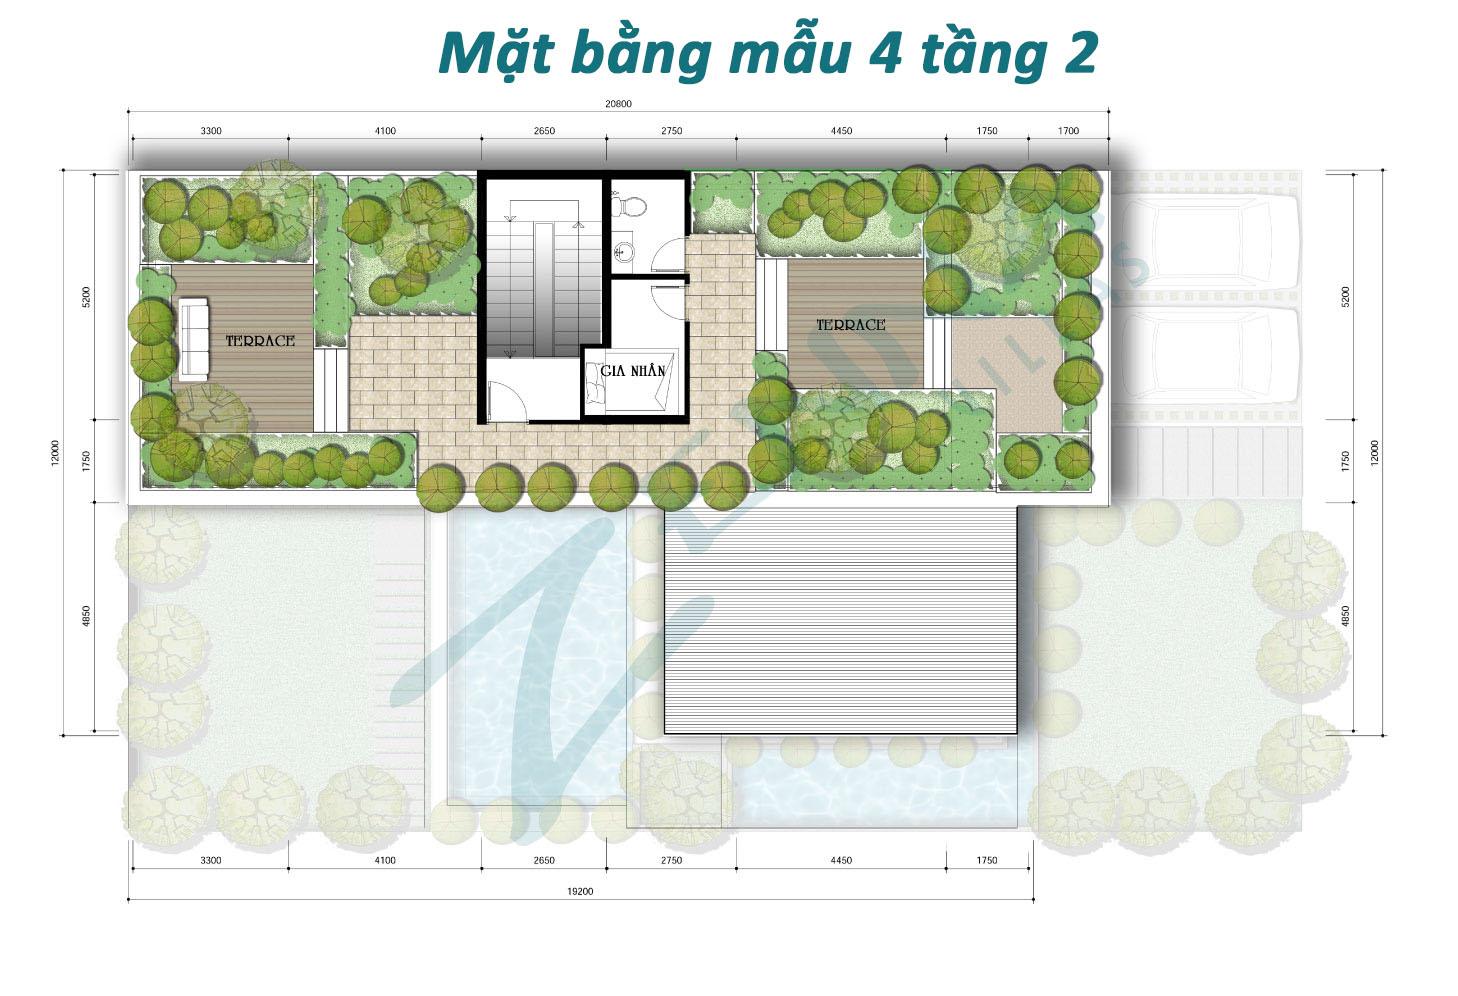 Mặt bằng tầng 2 mẫu 4 biệt thự Zenna Villas